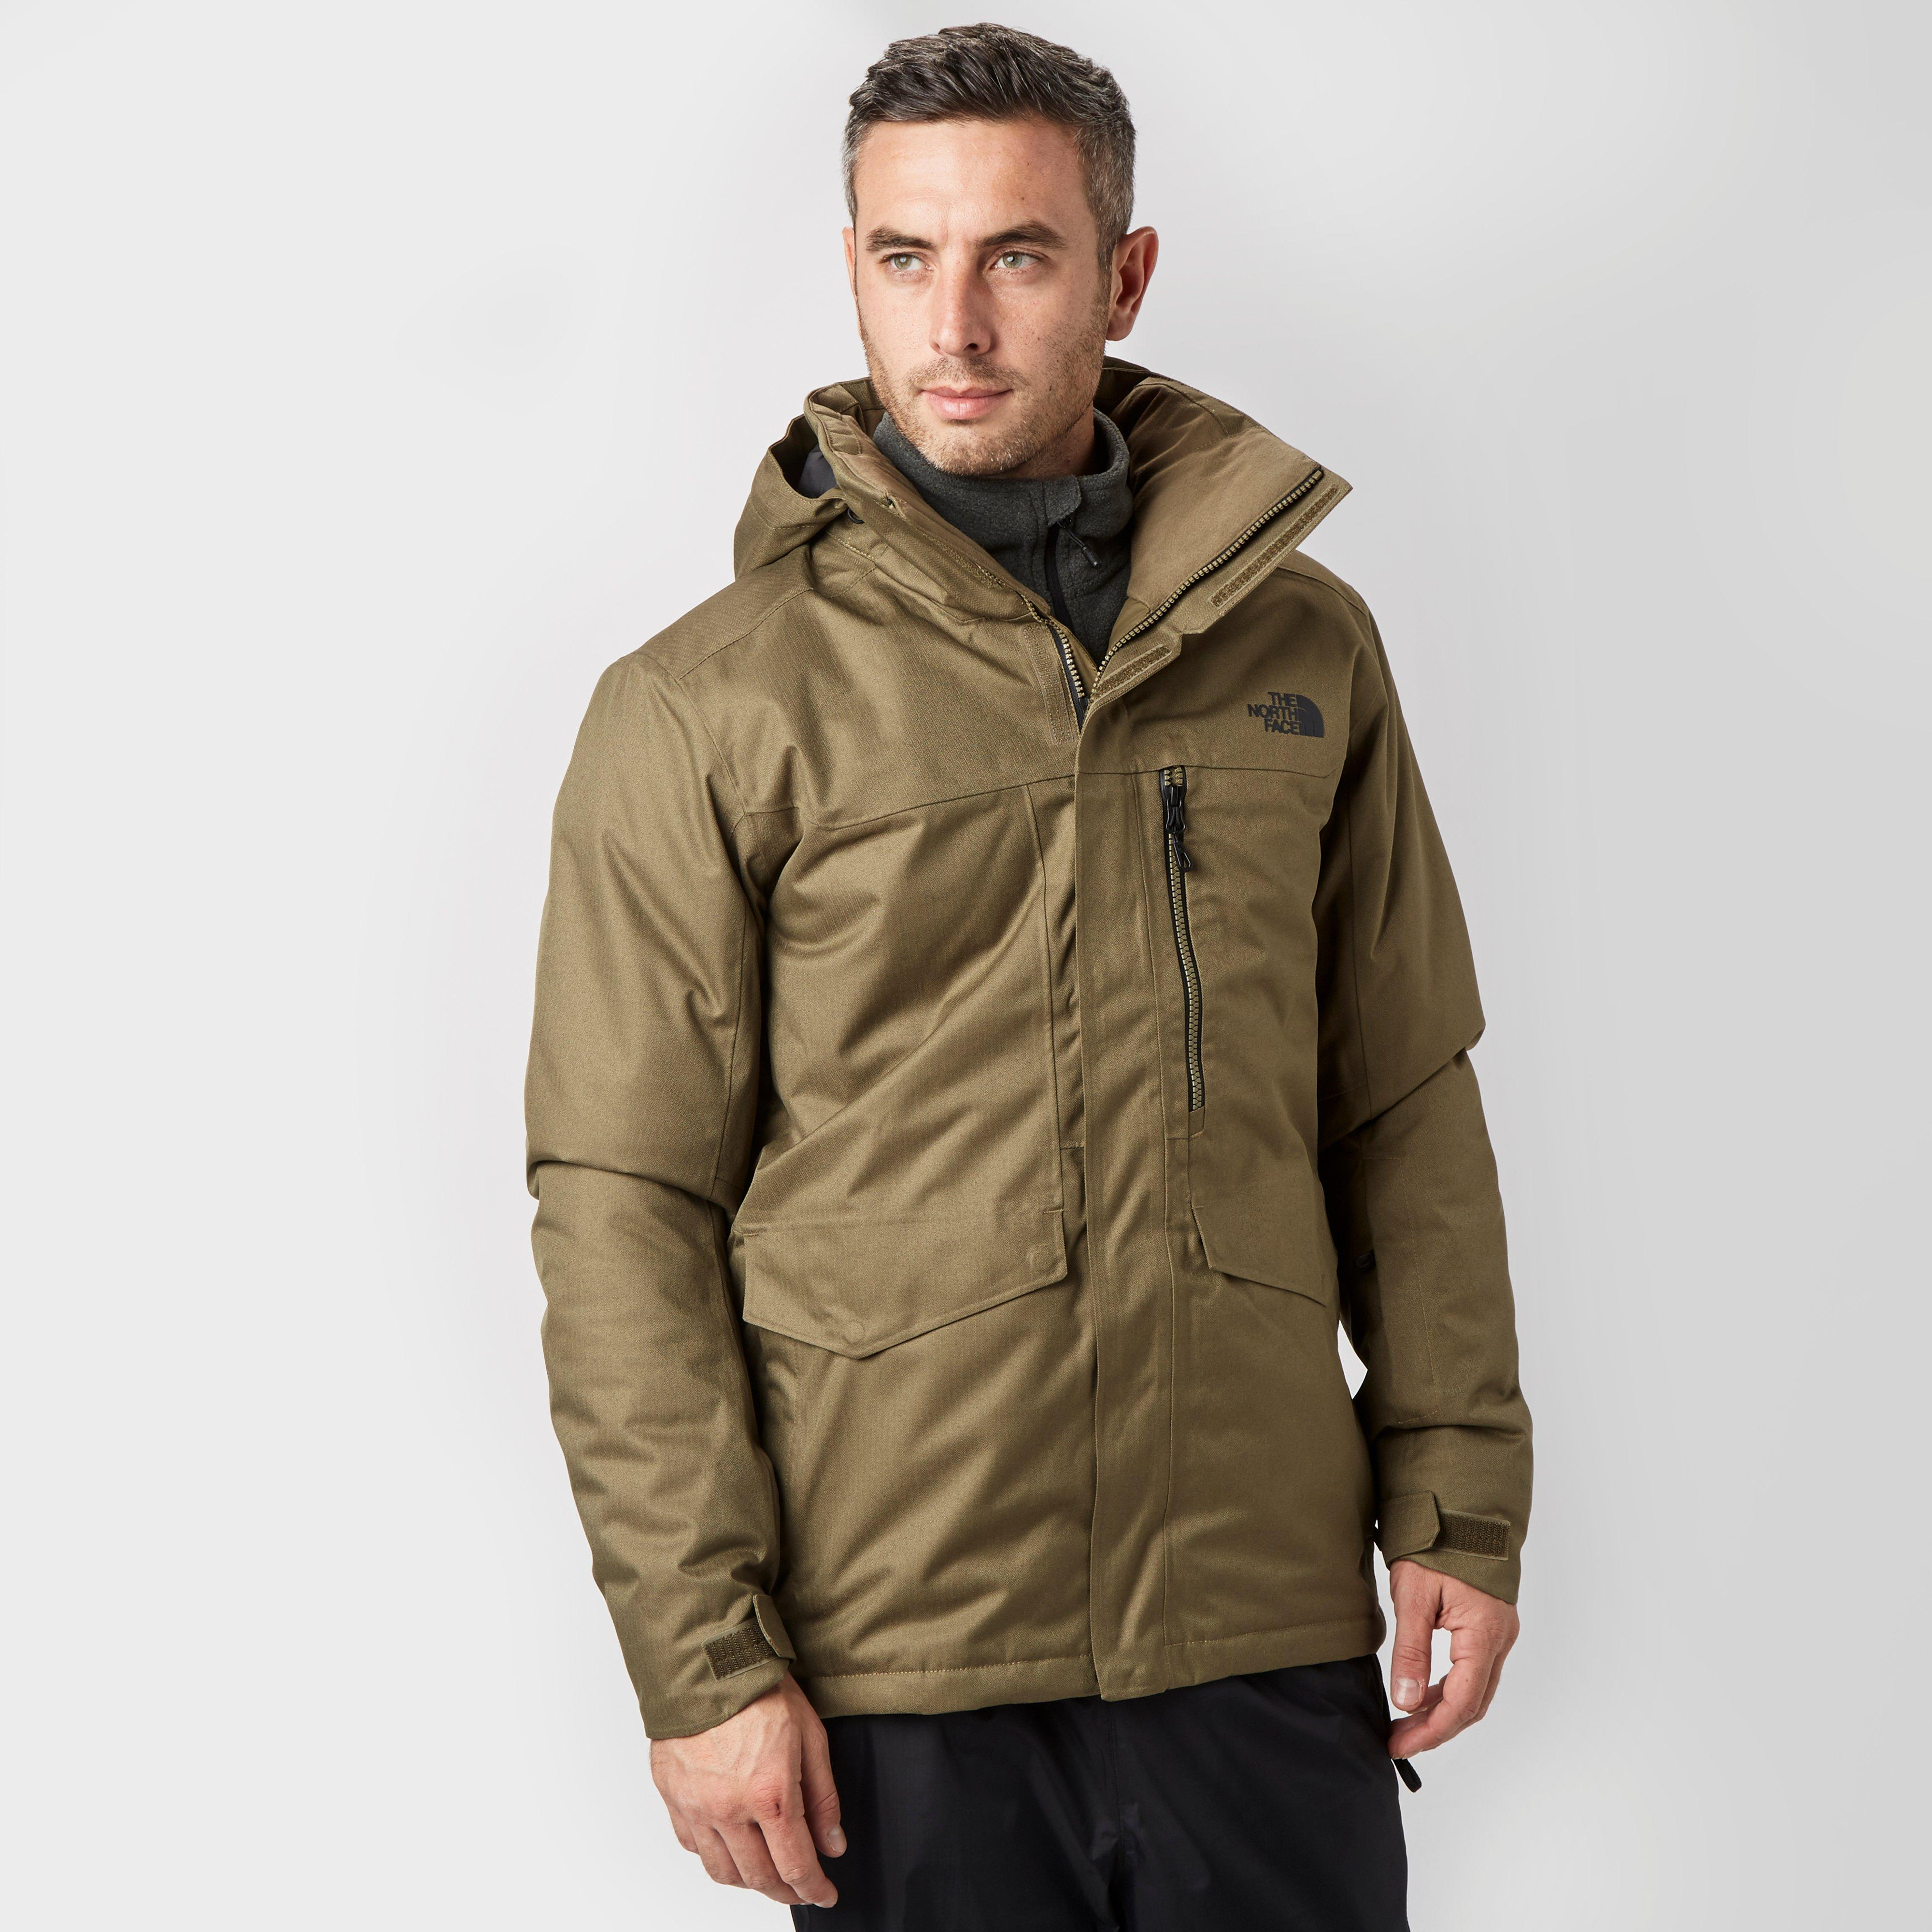 The North Face Mens Gatekeeper Jacket Khaki